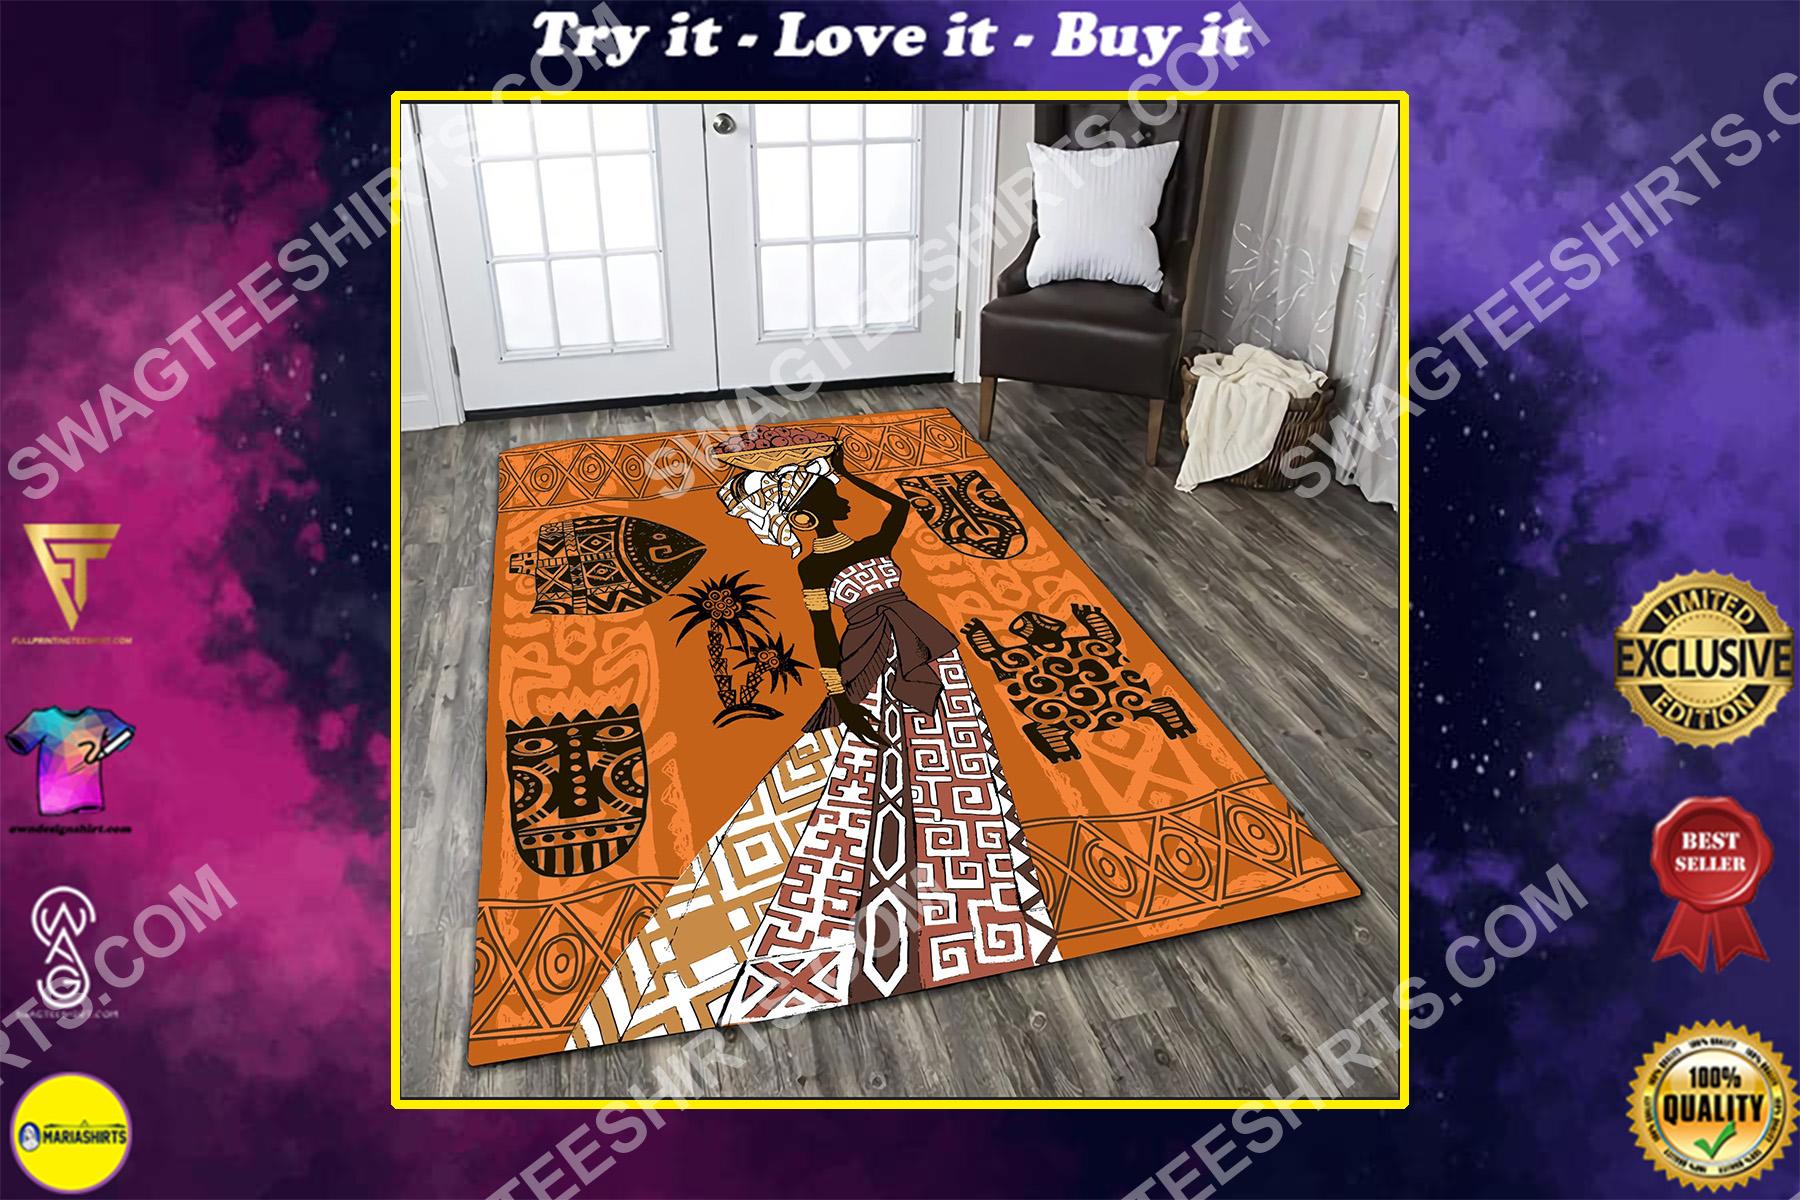 africa lady vintage all over printed rug